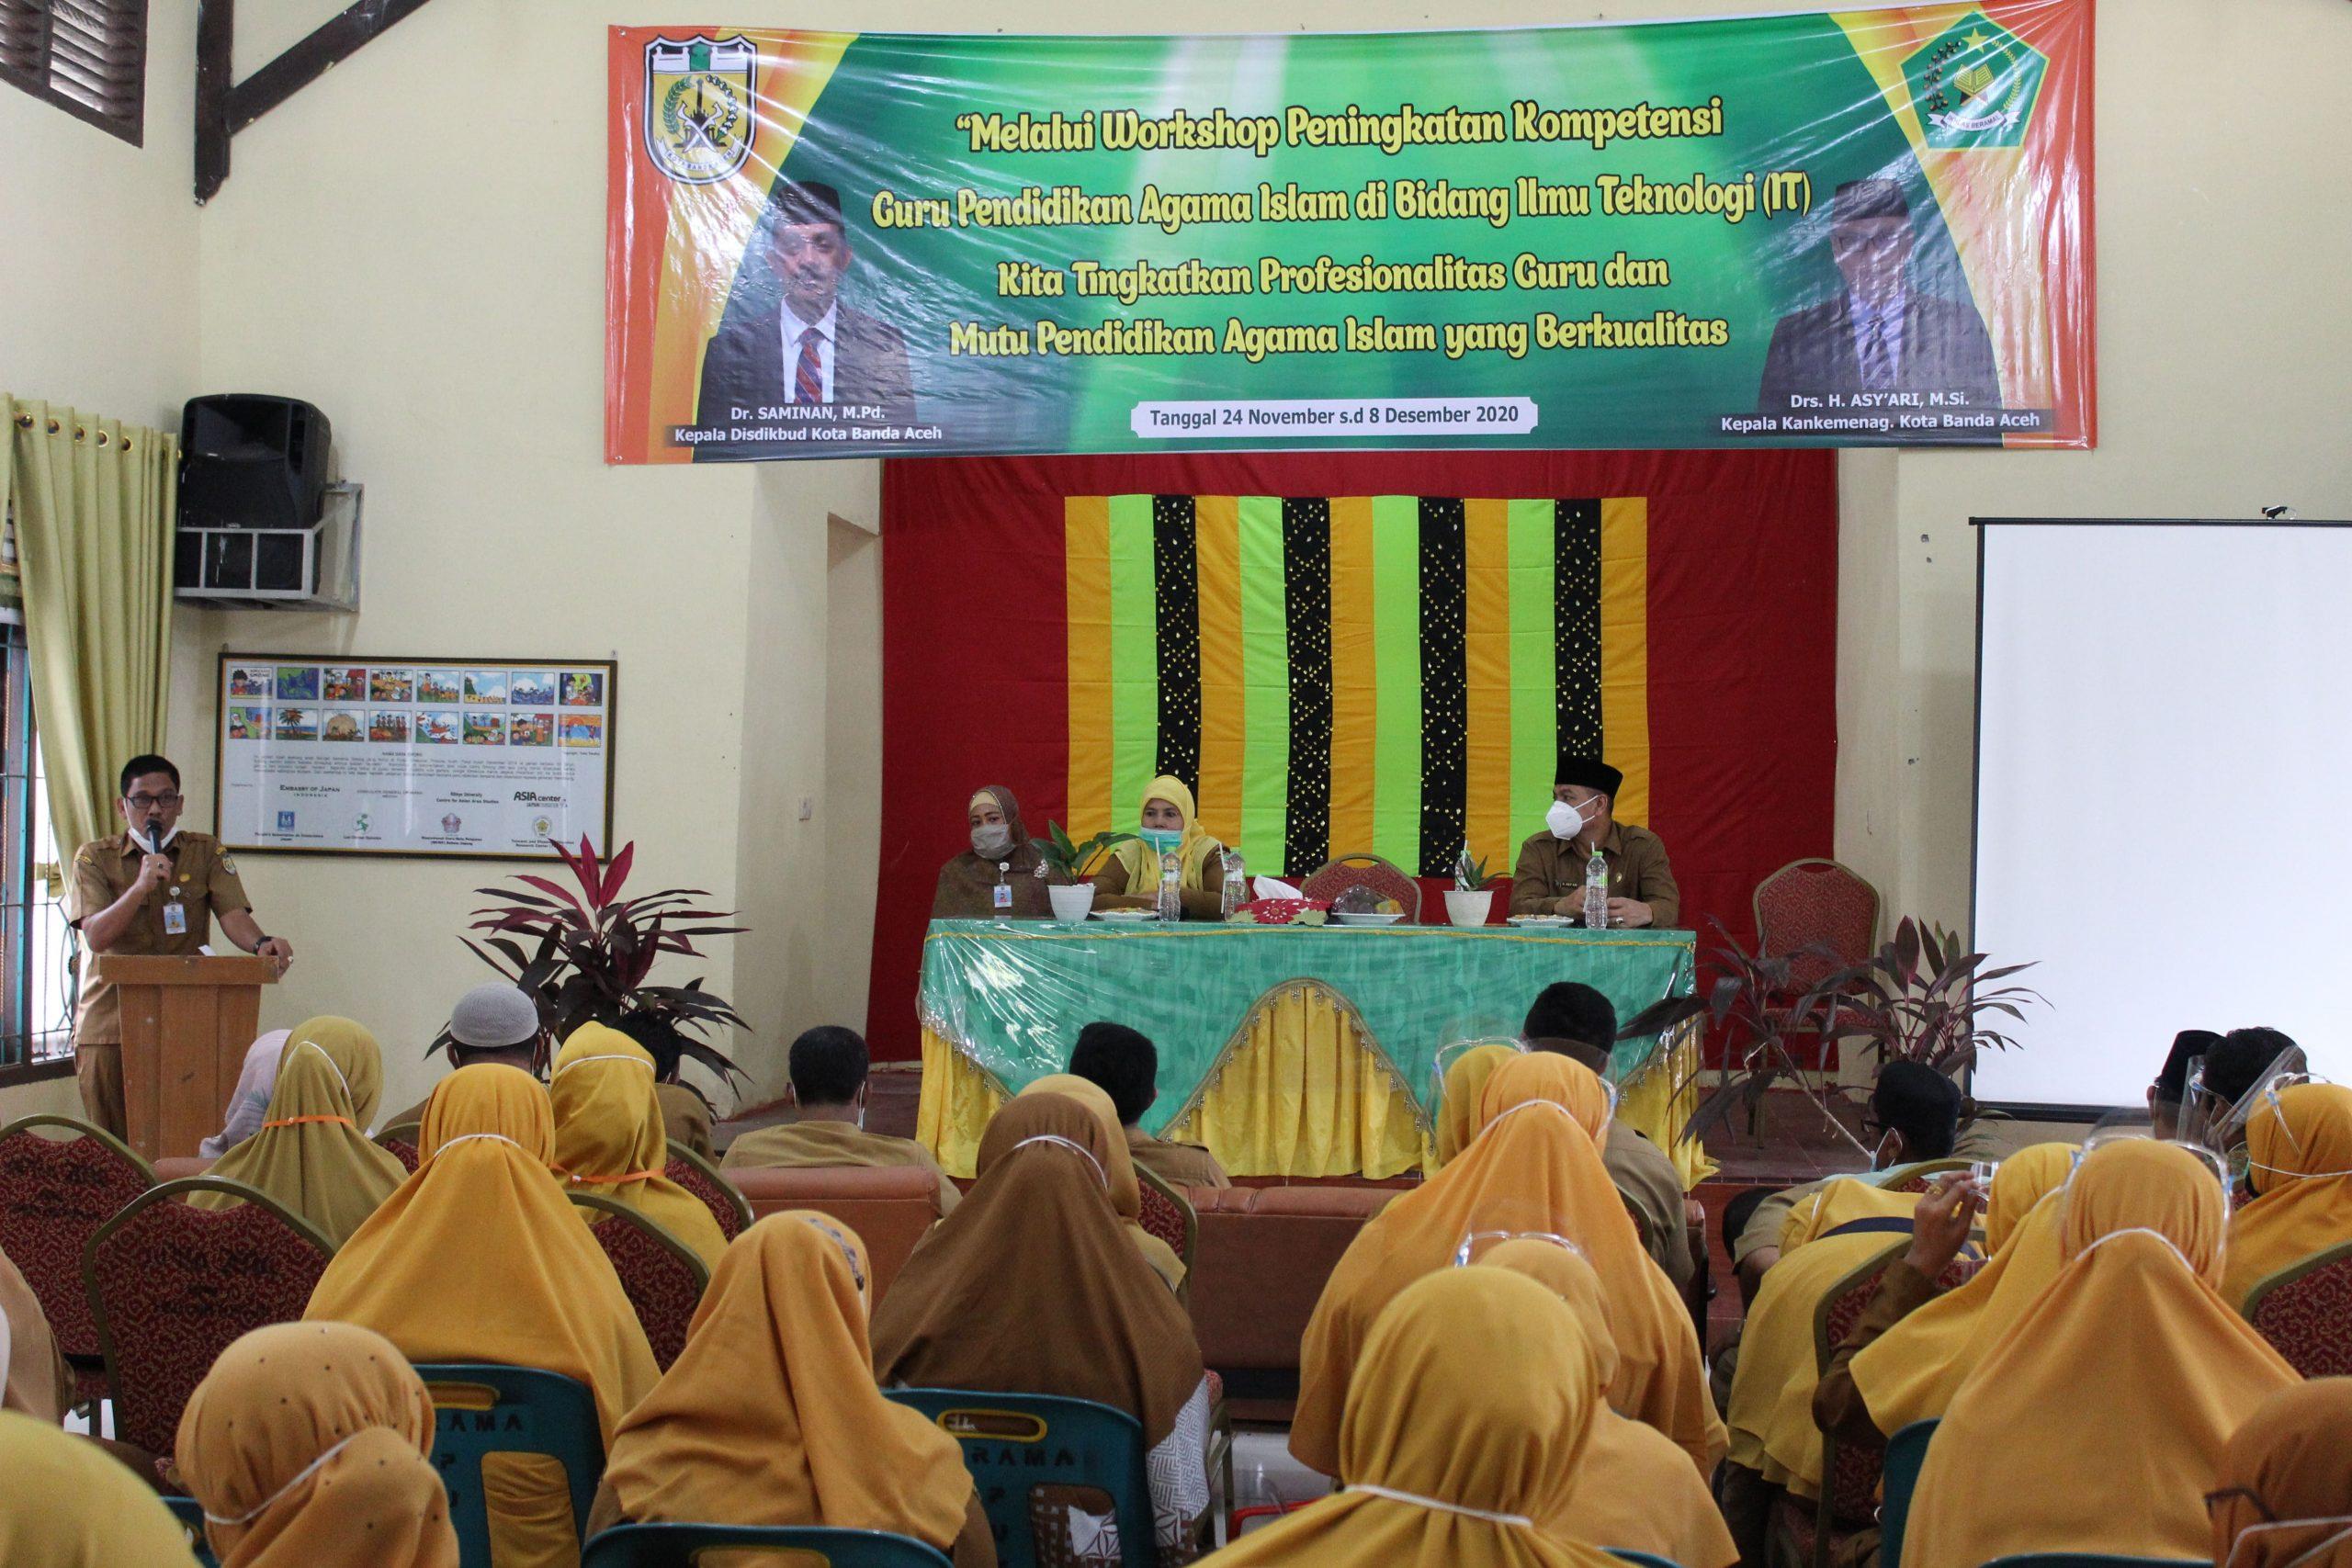 WorkShop Peningkatan Kompetensi Guru Pendidikan Agama Islam di Bidang Ilmu Teknologi (IT)